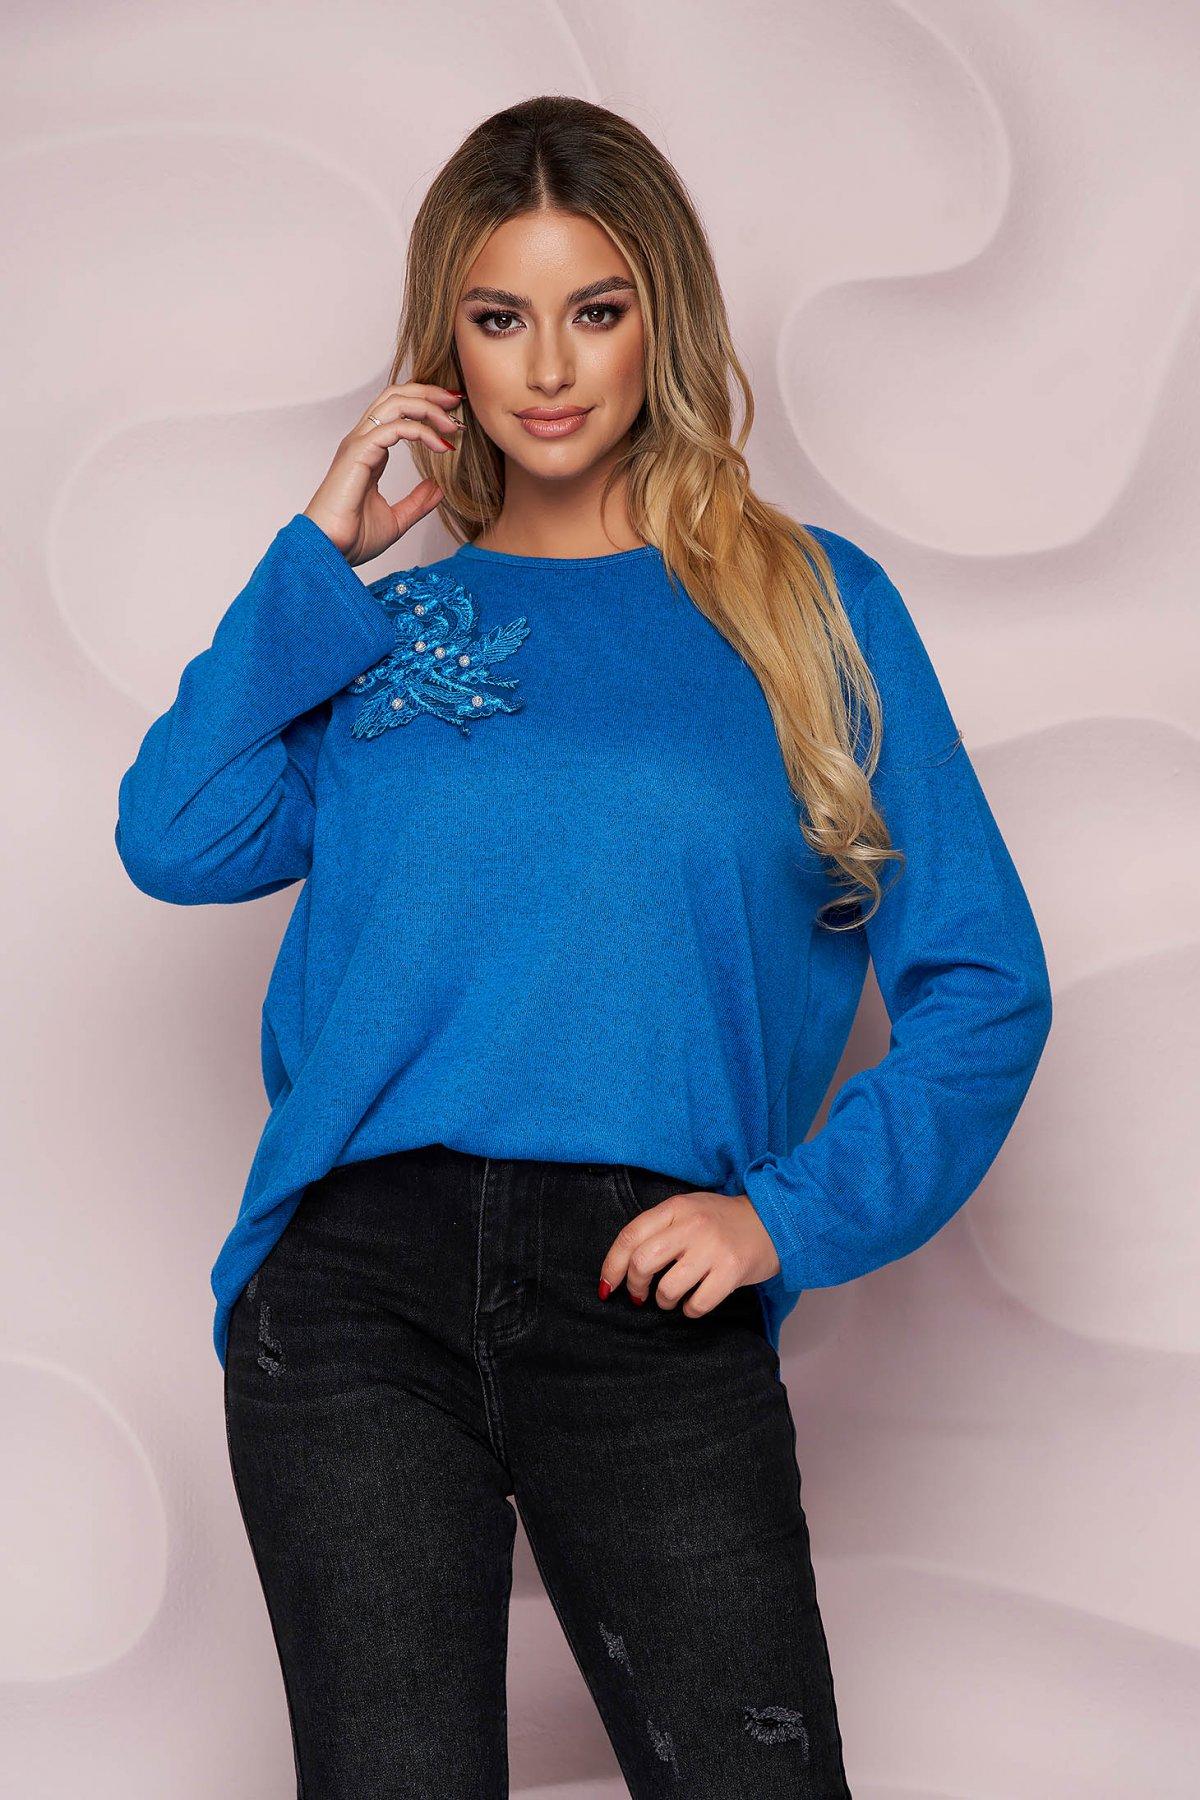 Bluza dama Lady Pandora albastra office cu croi larg din material tricotat elastic si subtire si broderie florala